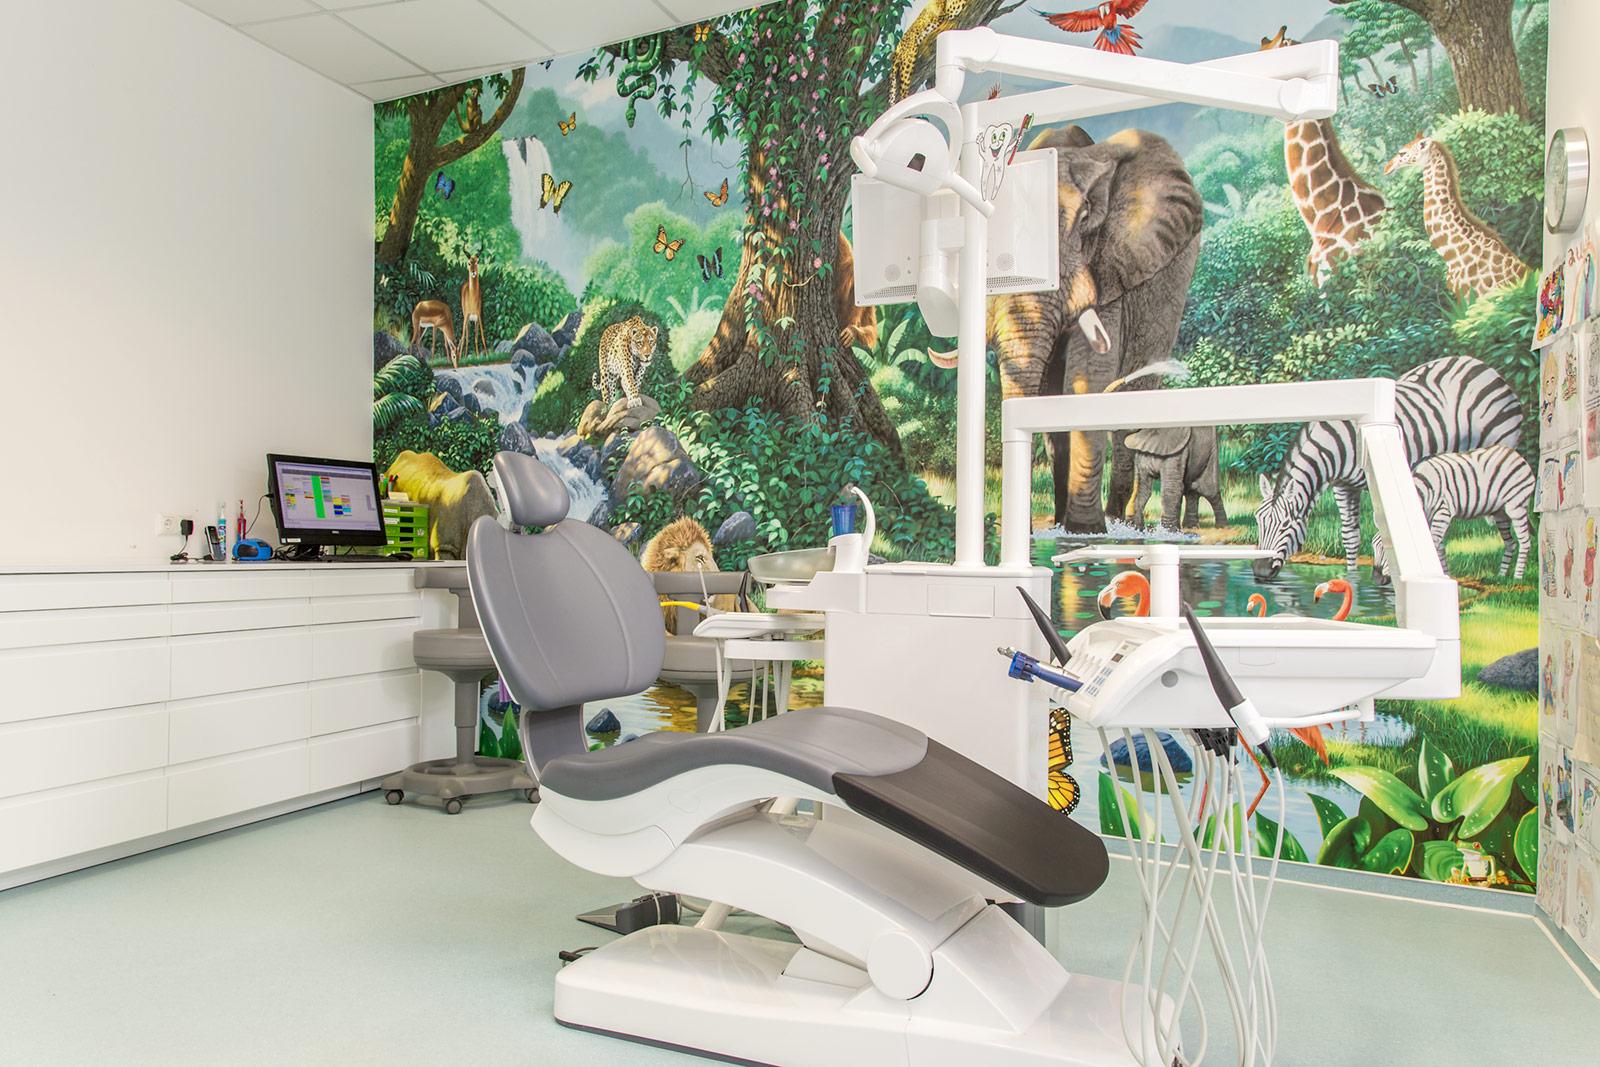 03 businessfotograf arztpraxis zahnarzt praxis welldent medical - Businessfotografie in der Zahnarztpraxis